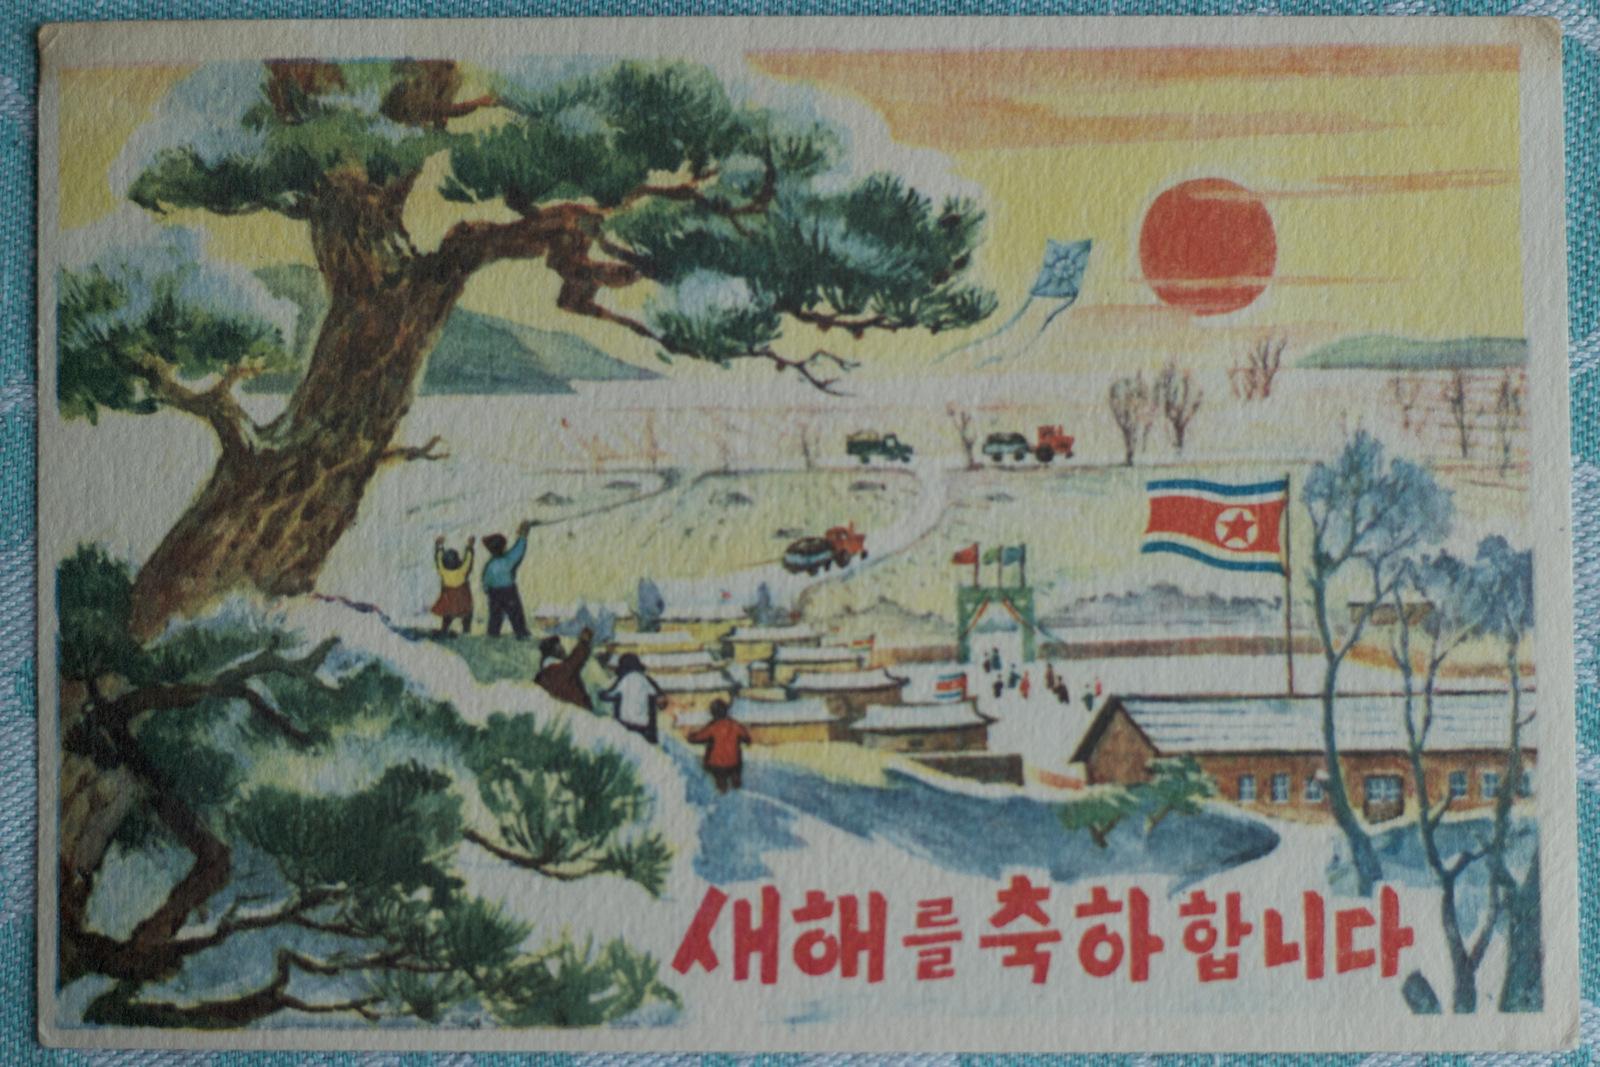 A festive postcard sent by littleLenyafrom the newly established DPRK